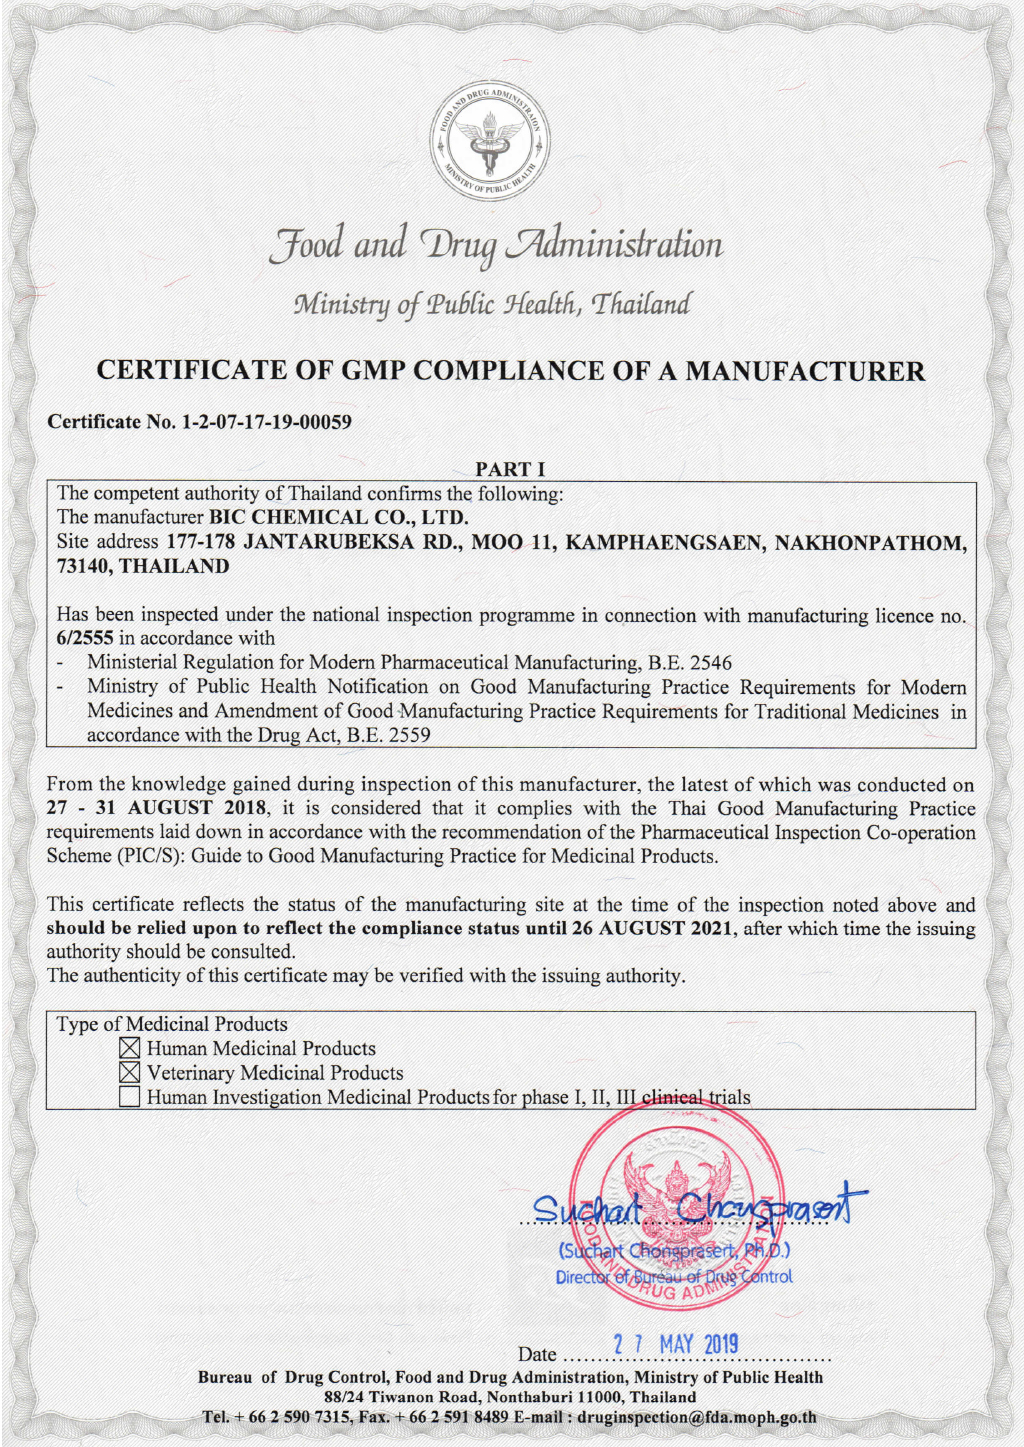 BIC CHEMICAL CO ,LTD